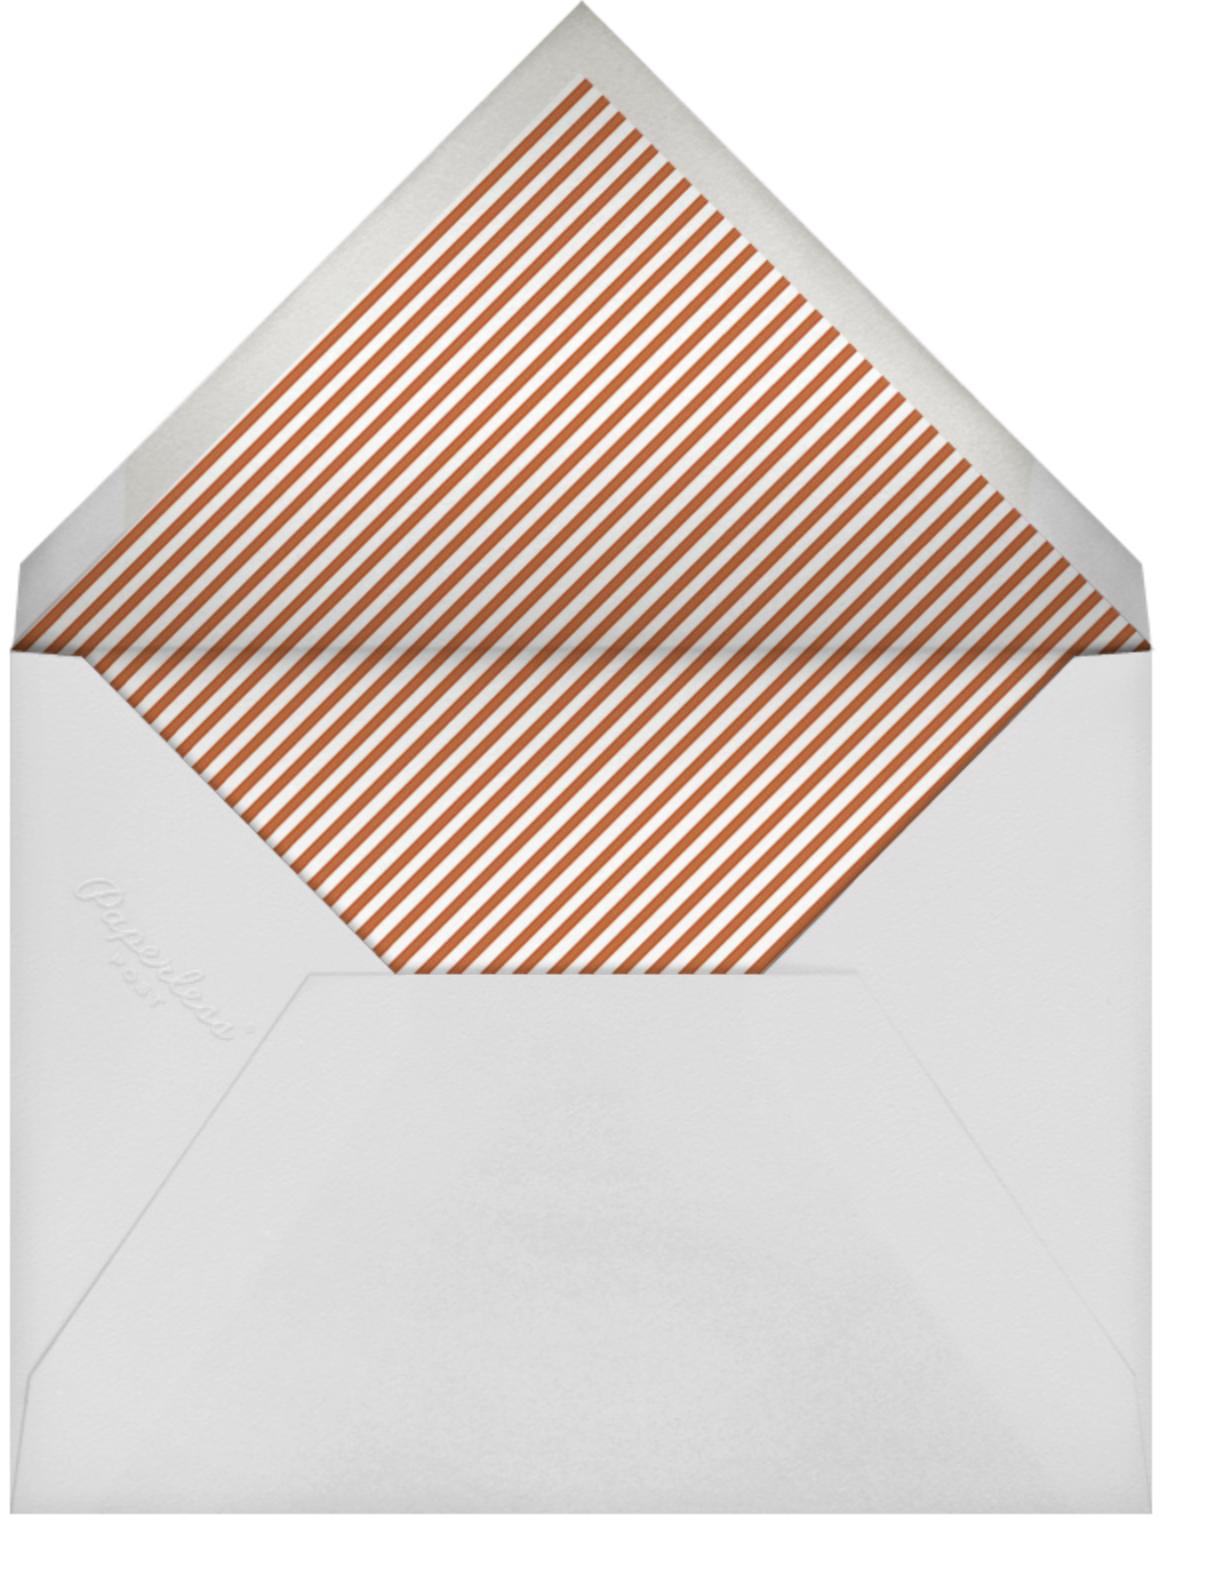 Stripe Border - Burnt Caramel - Paperless Post - Cocktail party - envelope back